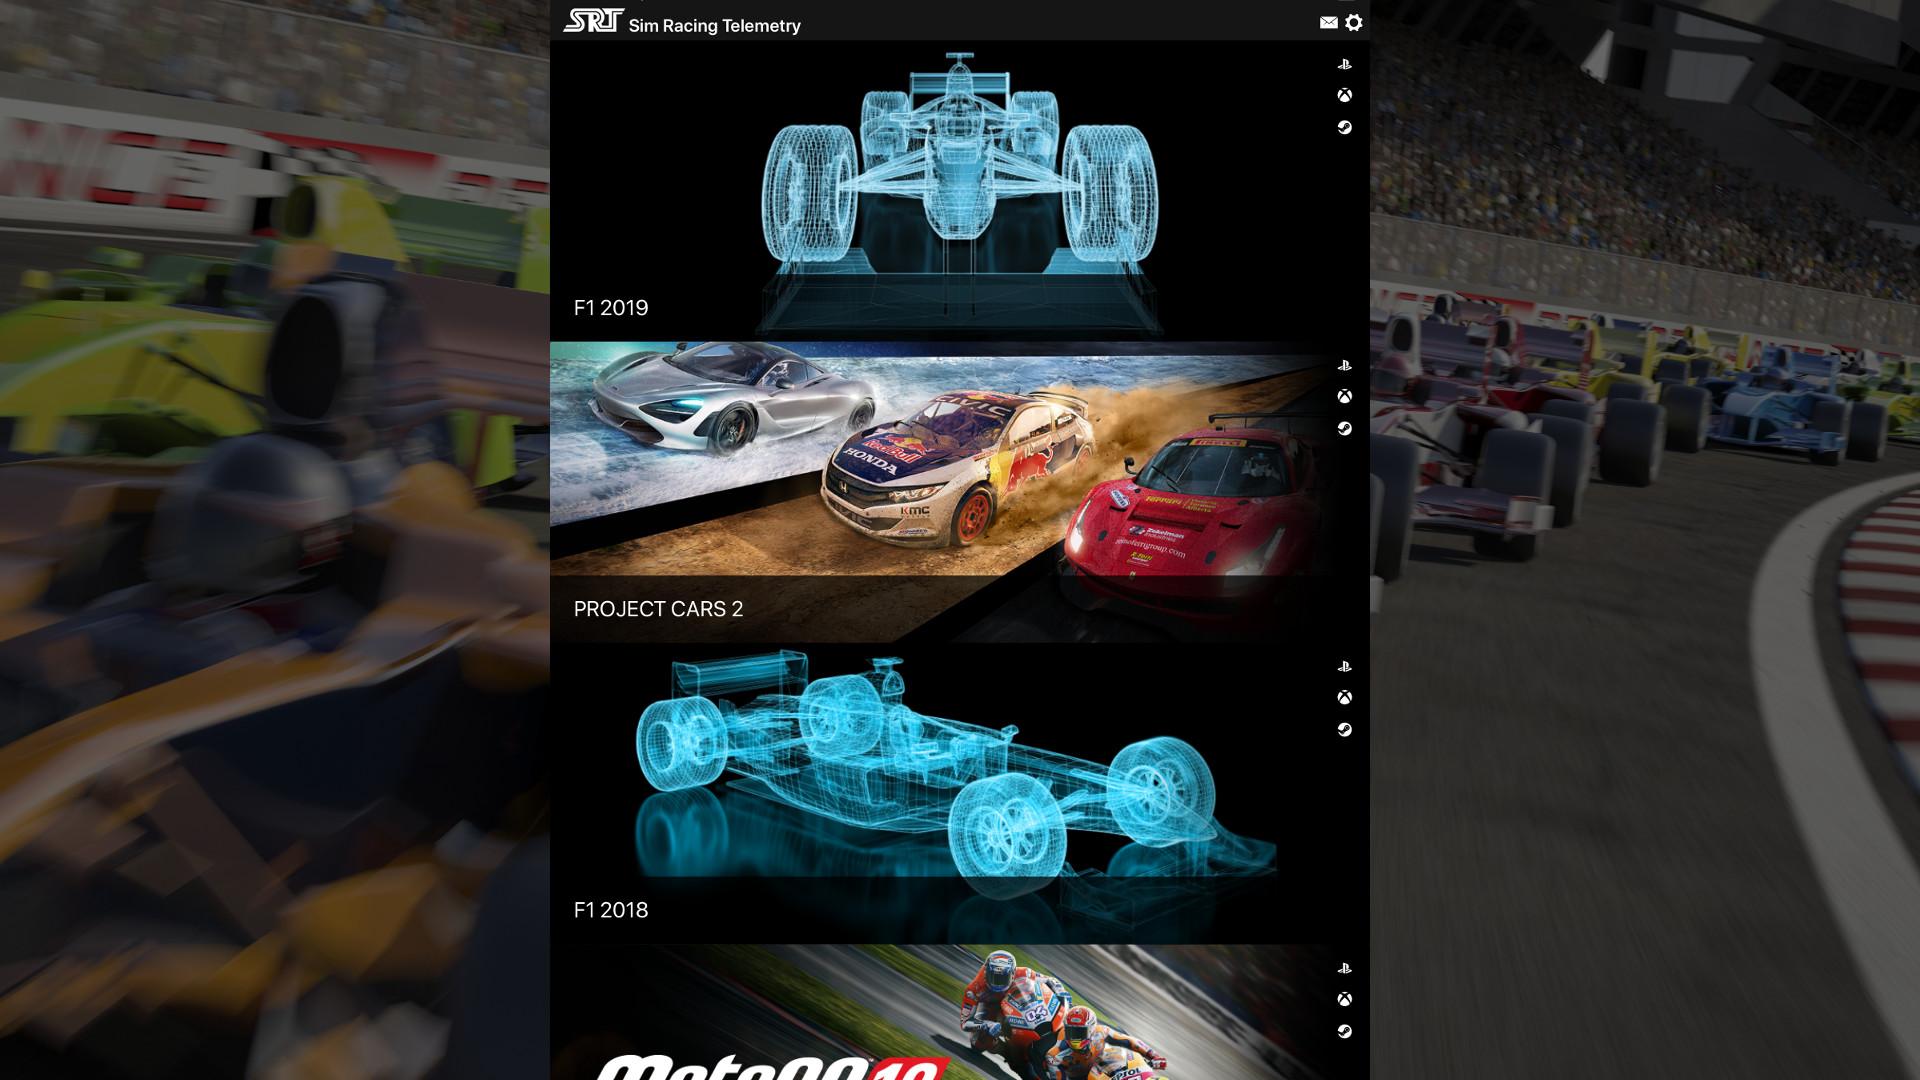 Sim racing telemetry - f1 2020 download free download